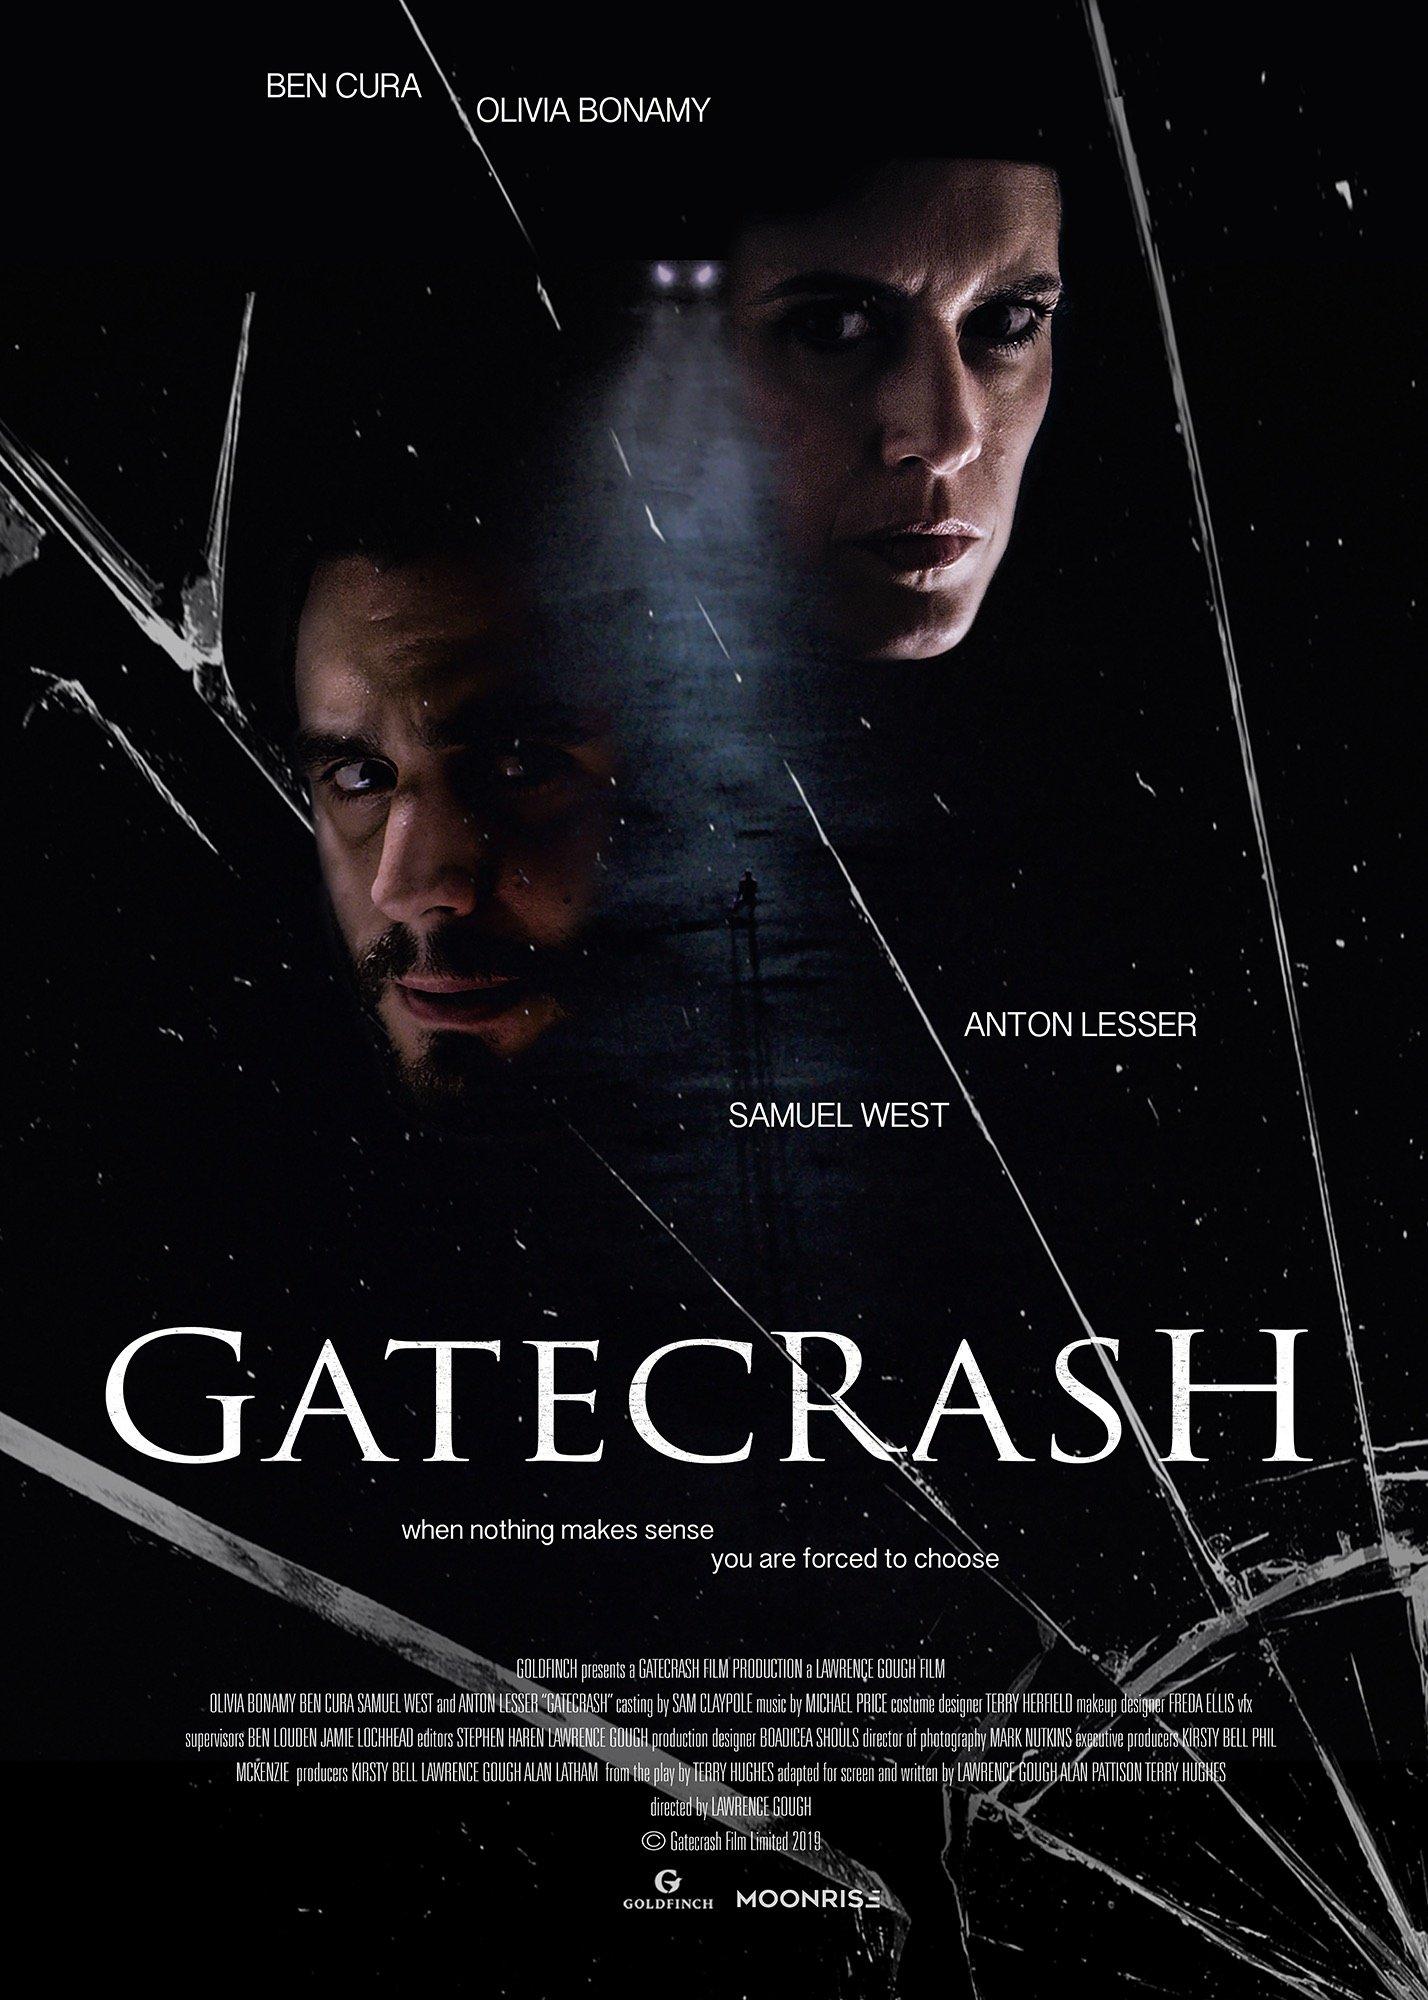 Gatecrash poster image